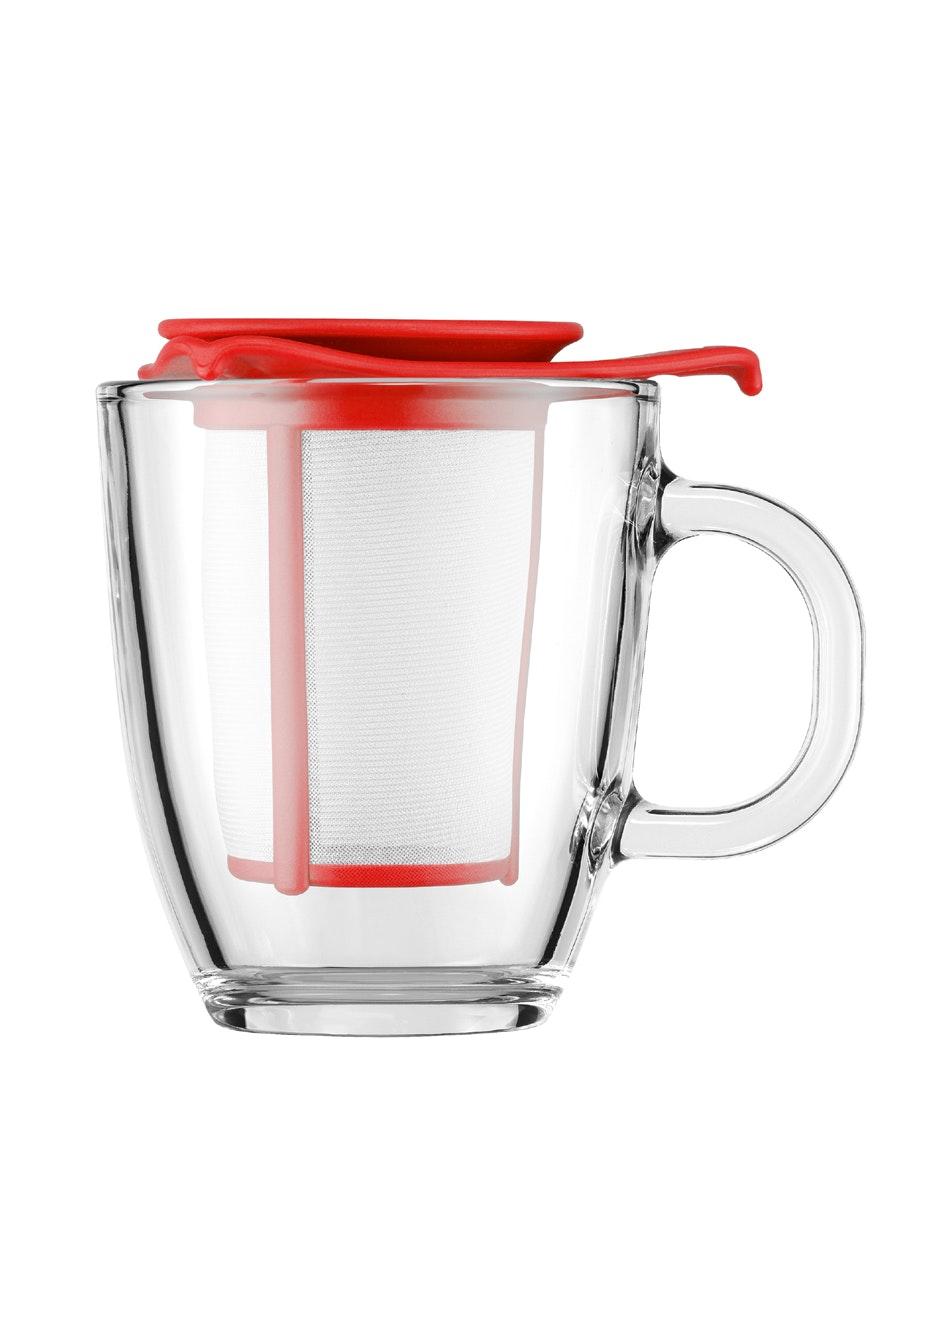 Bodum - Mug And Tea Strainer, 0.35L - Red